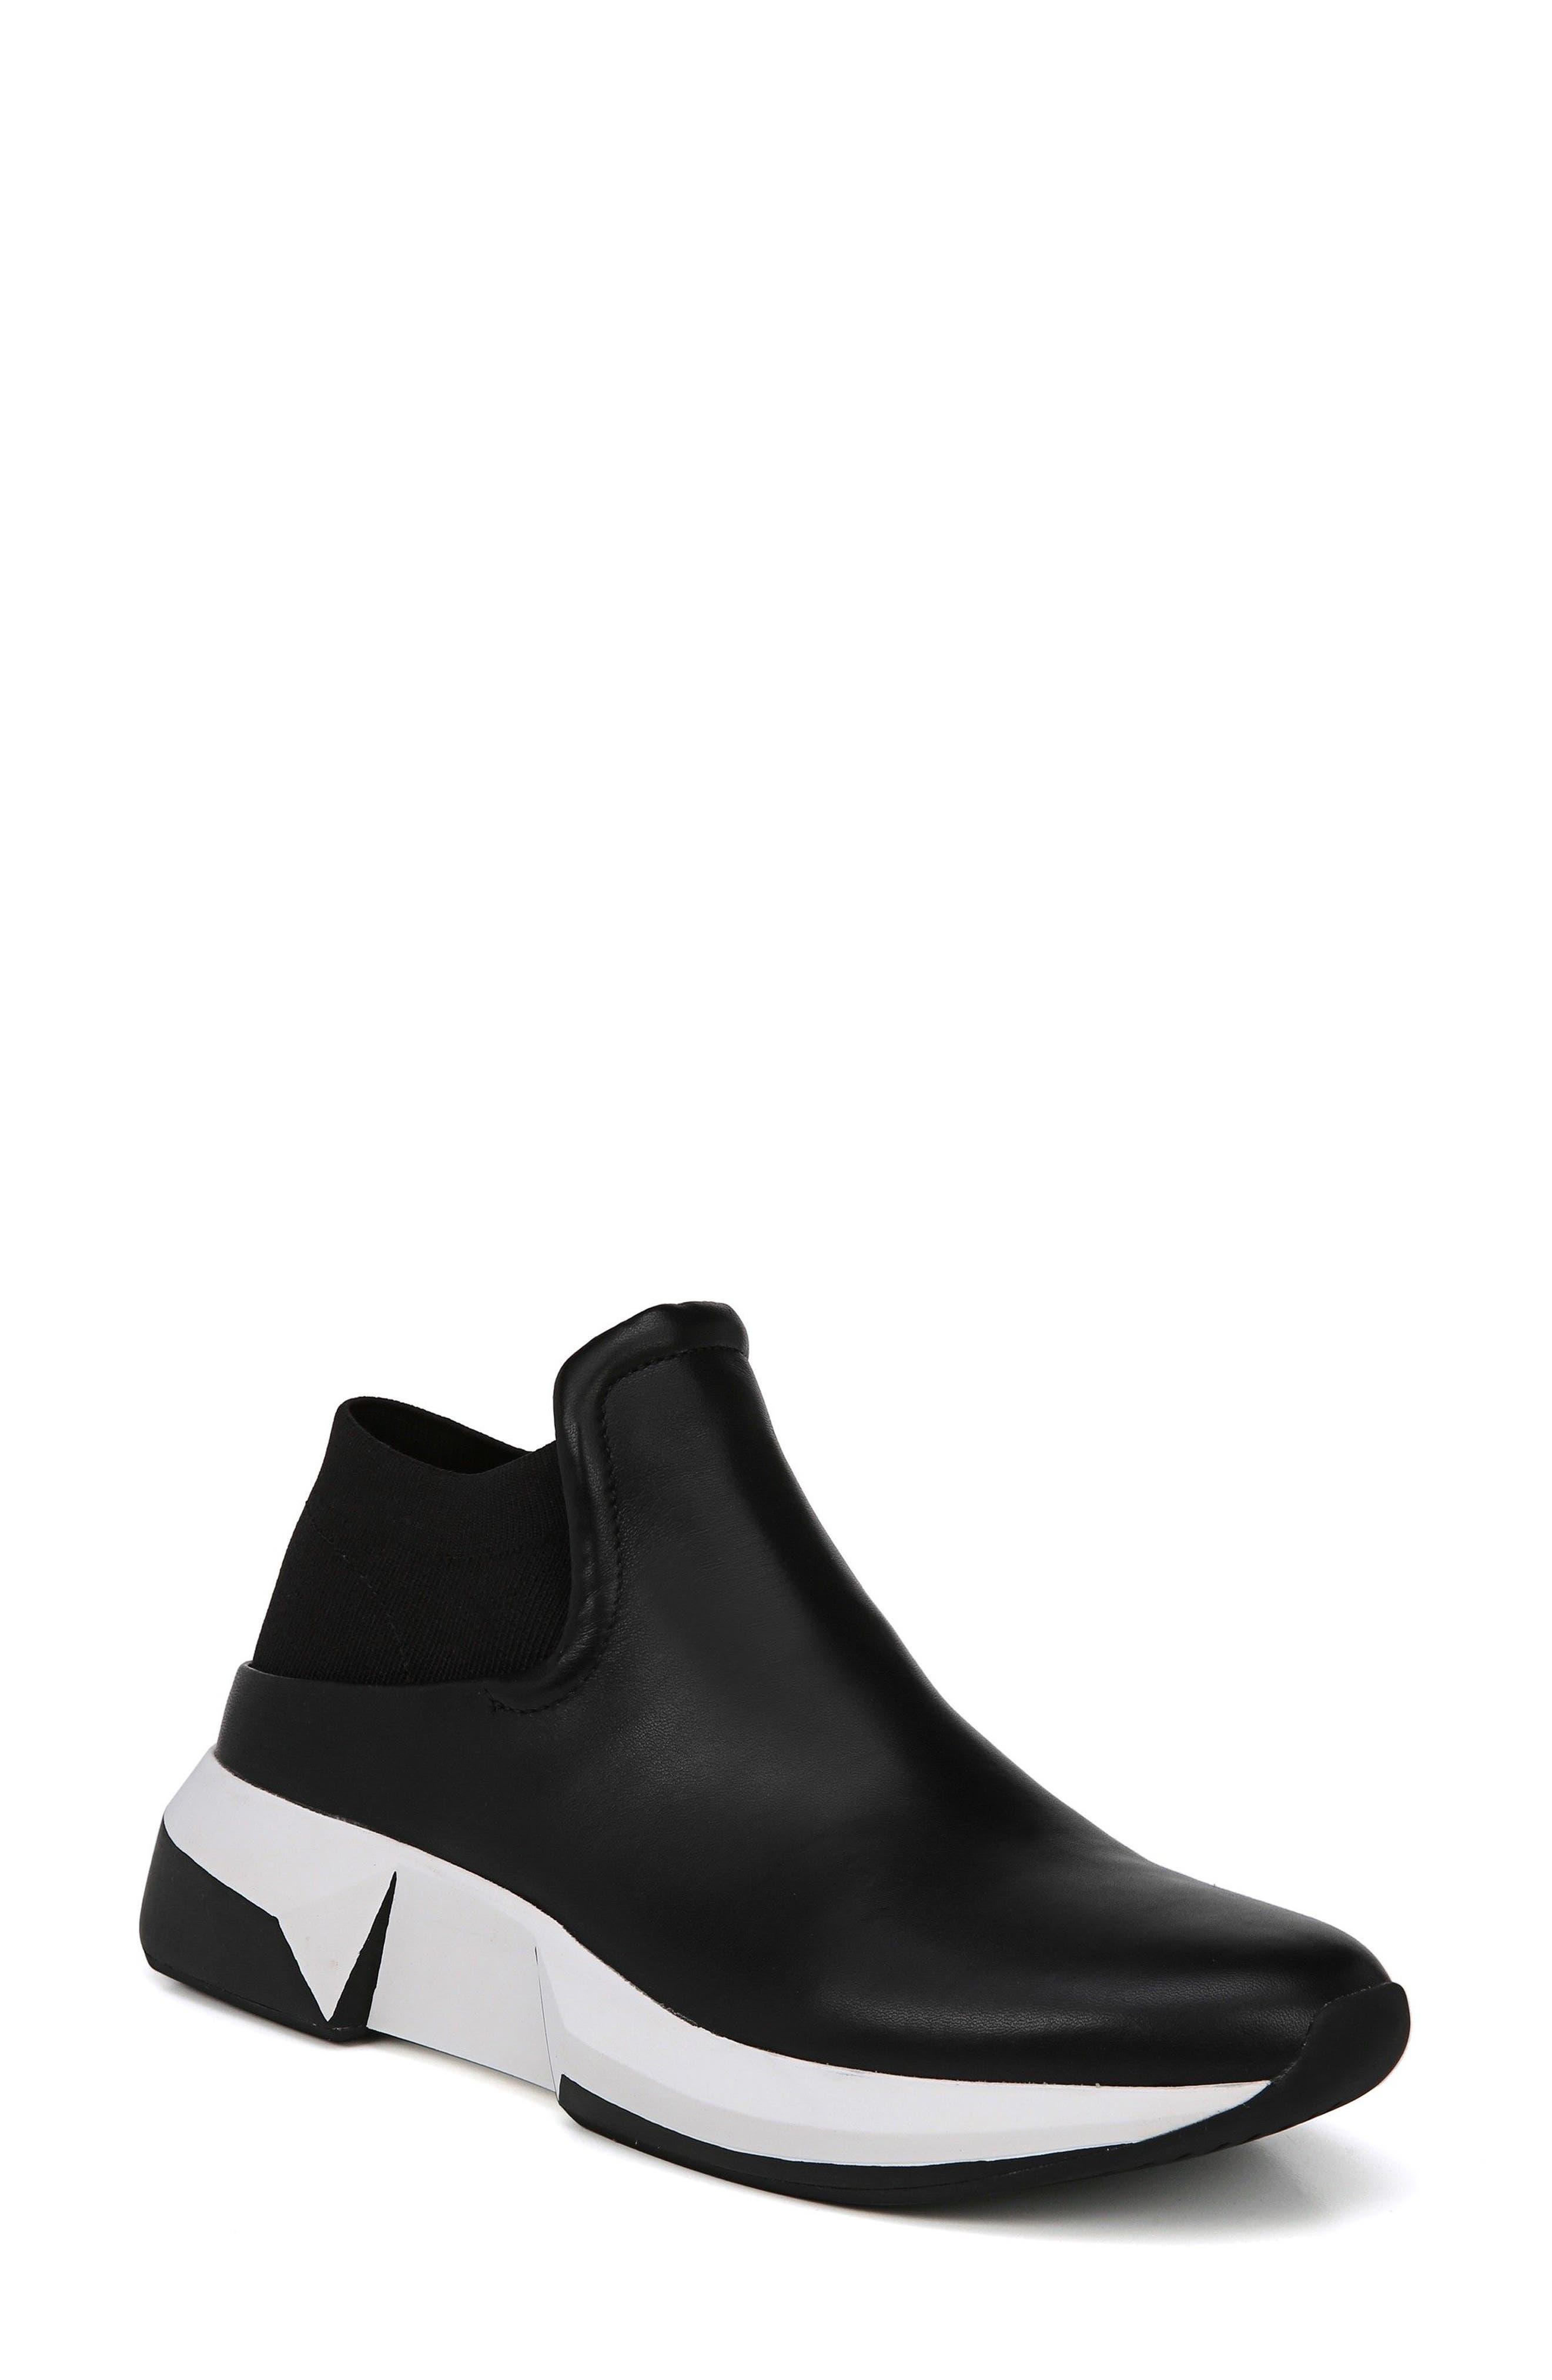 Veila Slip-On Sneaker,                         Main,                         color, Black Leather